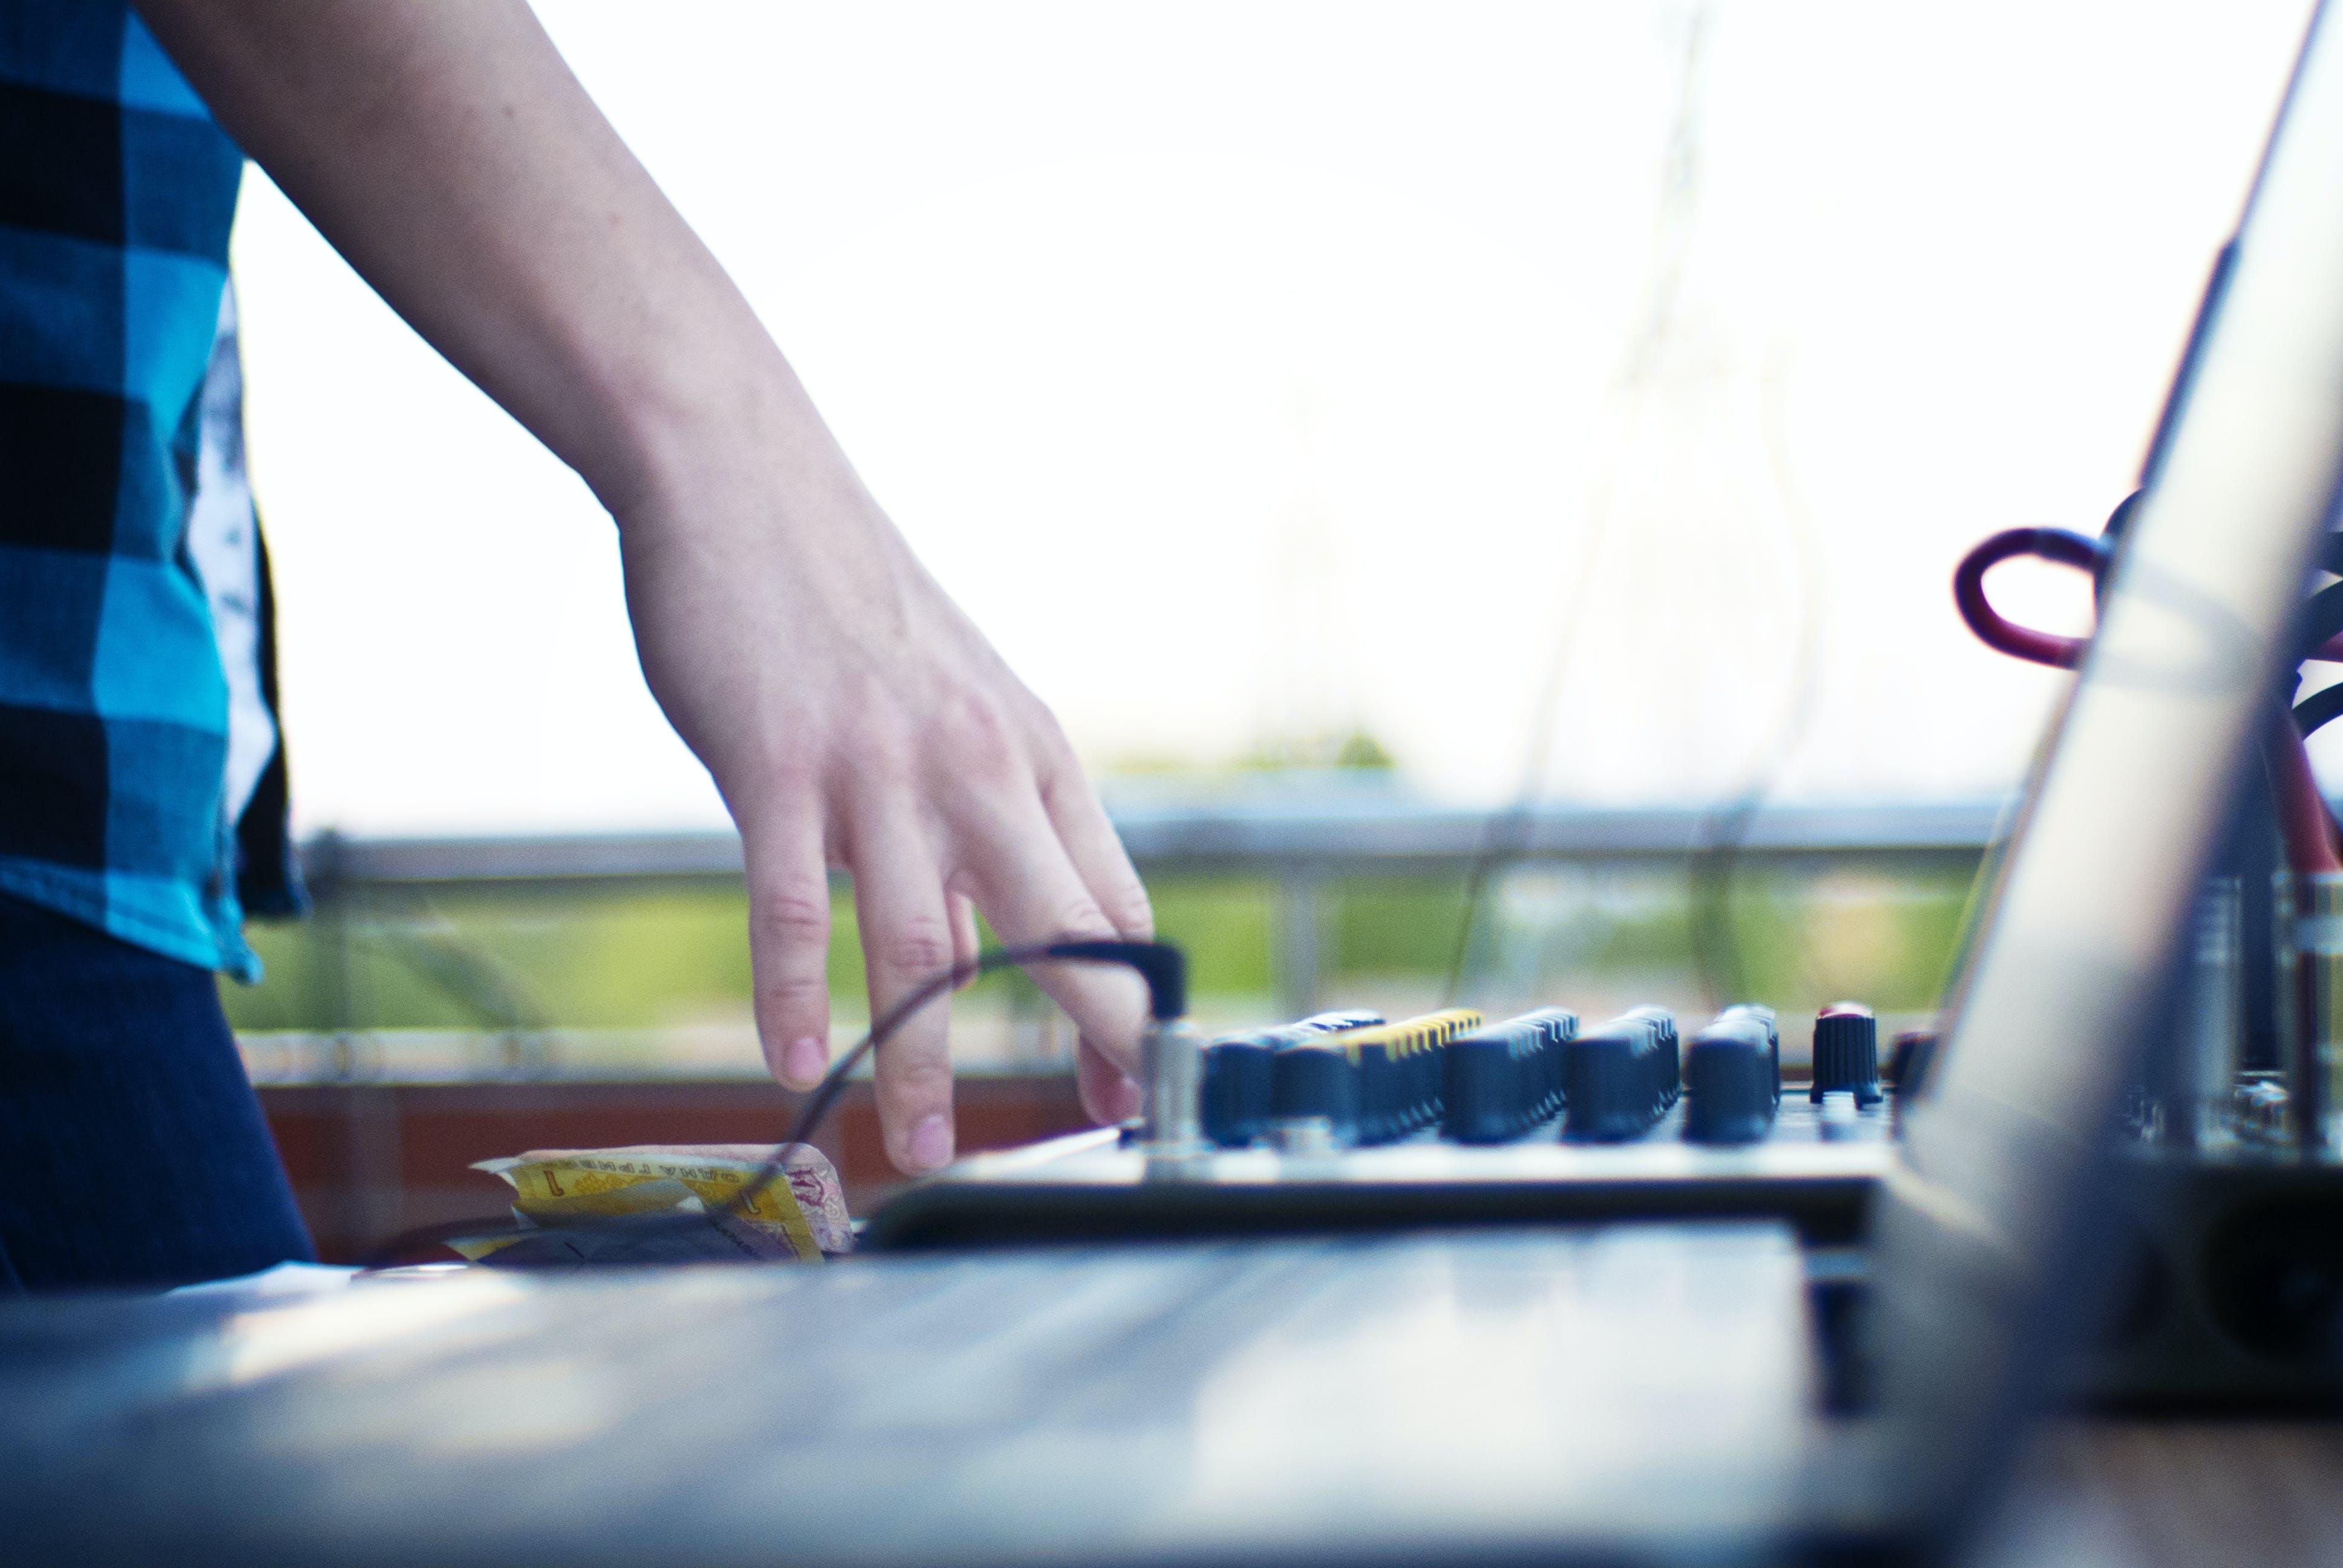 Kostenloses Stock Foto zu dj, hand, laptop, musik